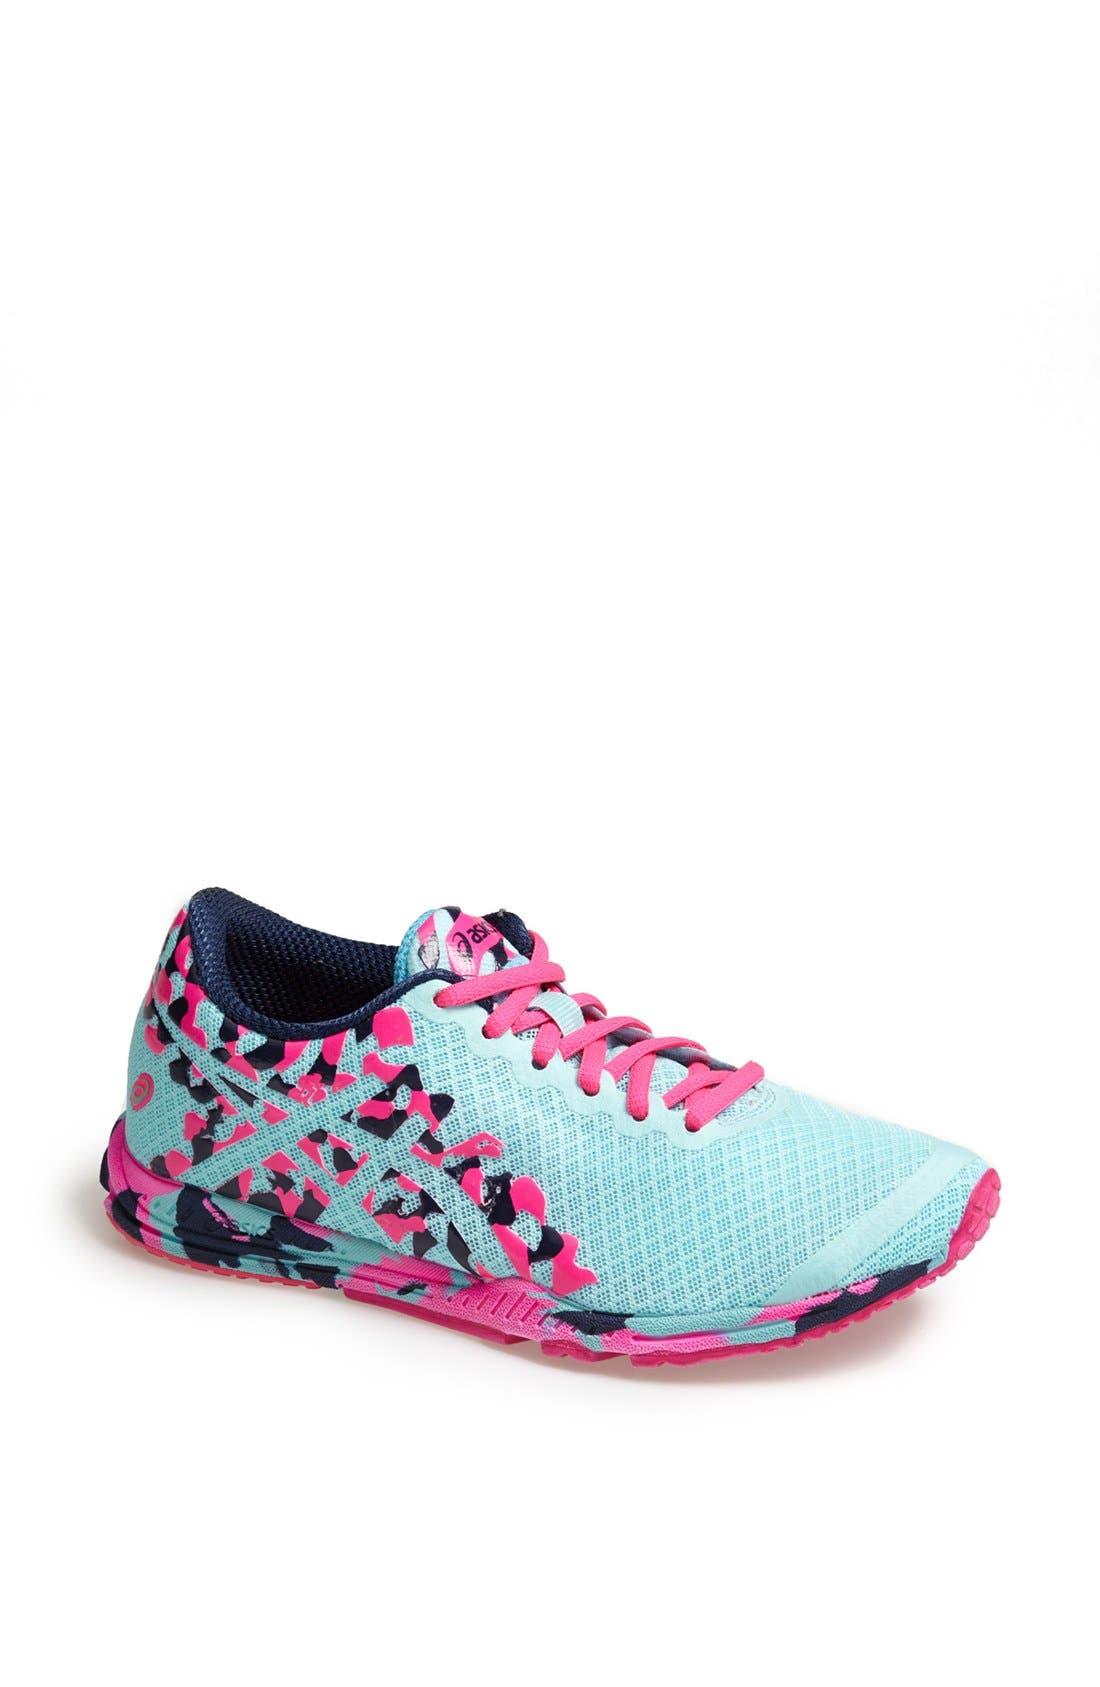 Main Image - ASICS® 'GEL-NoosaFast 2' Running Shoe (Women)